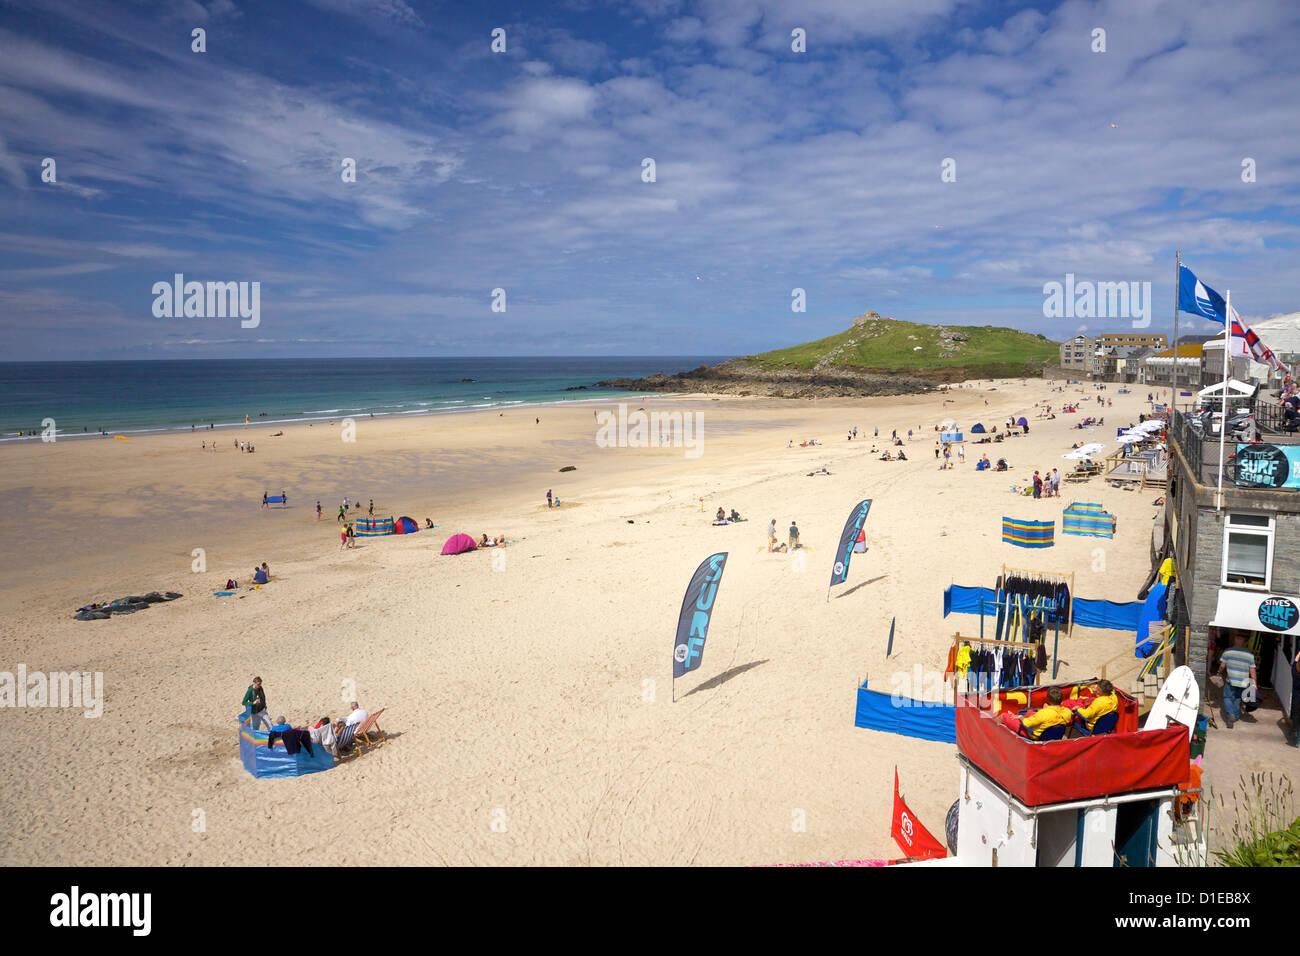 Summer sunshine on Porthmeor beach, St. Ives, Cornwall, England, United Kingdom, Europe Stock Photo